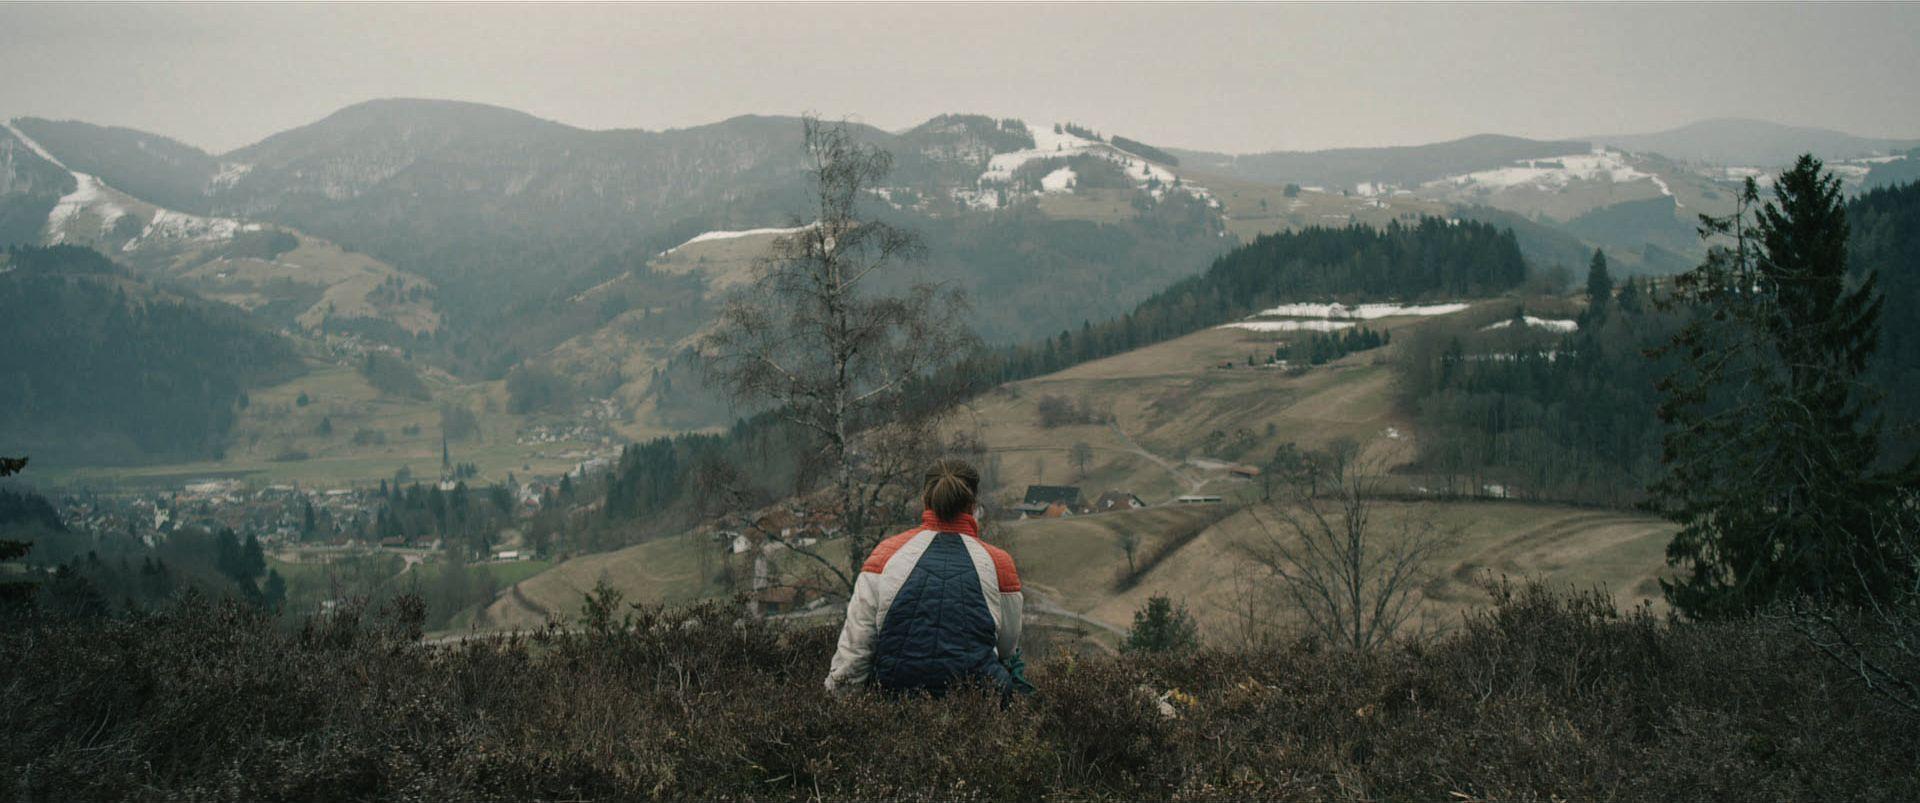 """Stubborn Boy"", reż. Moritz Kramer (źródło: materiały prasowe dystrybutora)"